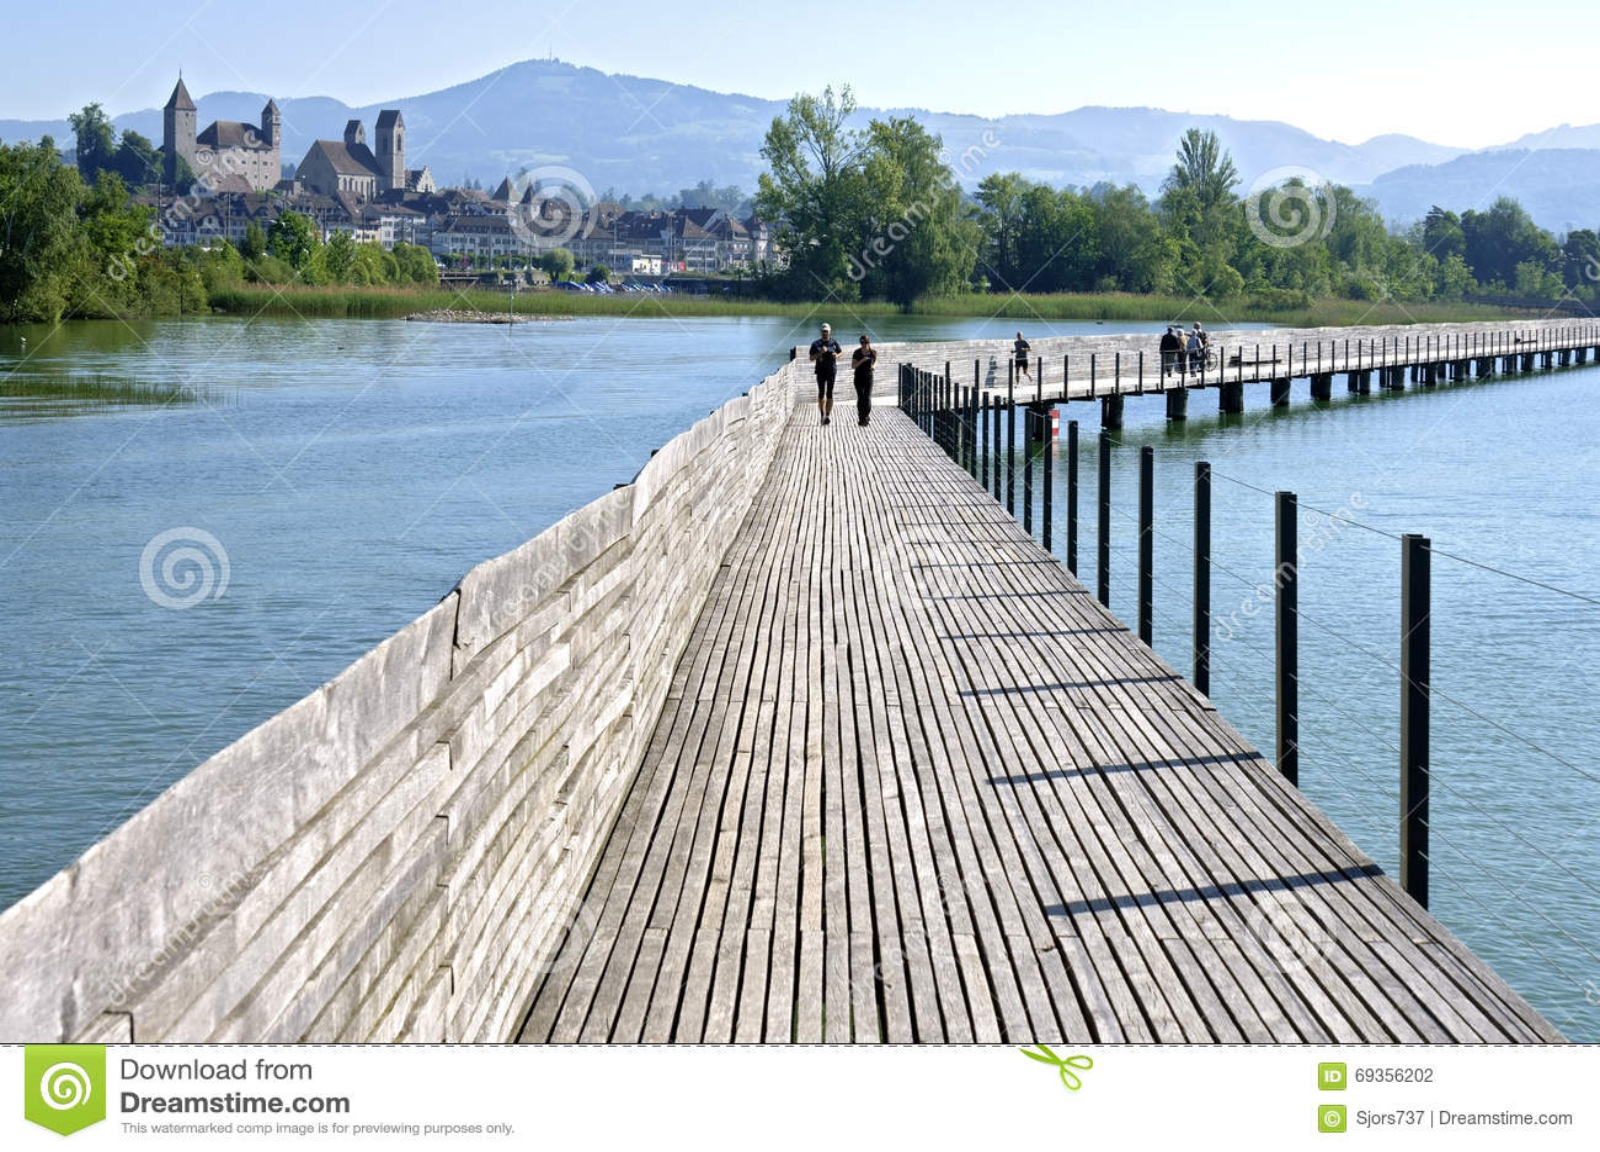 Footbridge of pfaffikon over lake zurich switzerland for Innendekoration pfaffikon zh